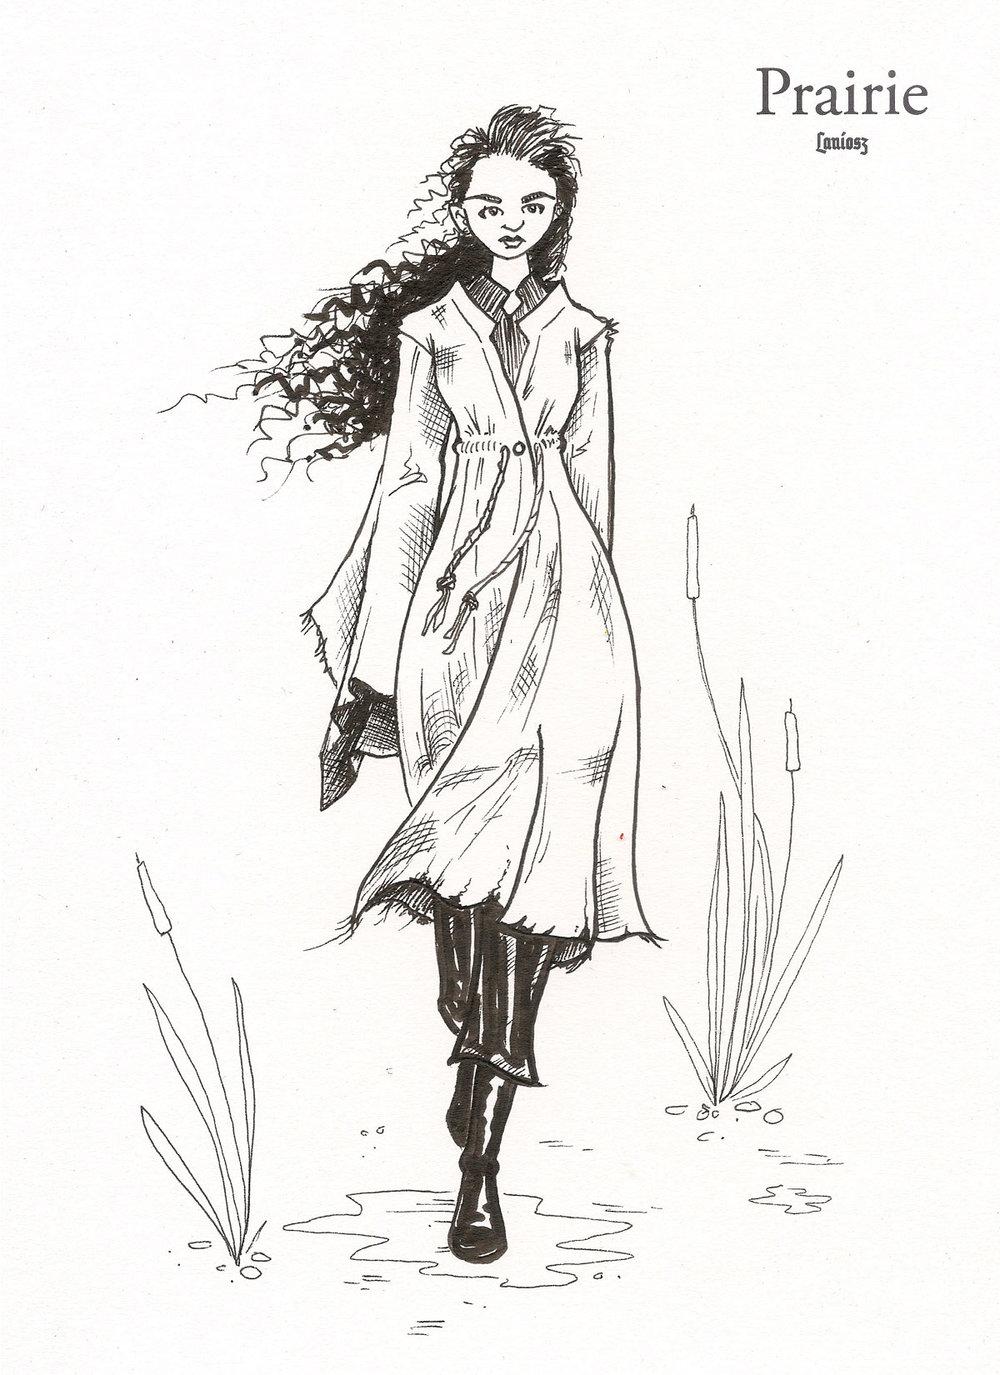 laniosz-prairie-sketch-1.jpg